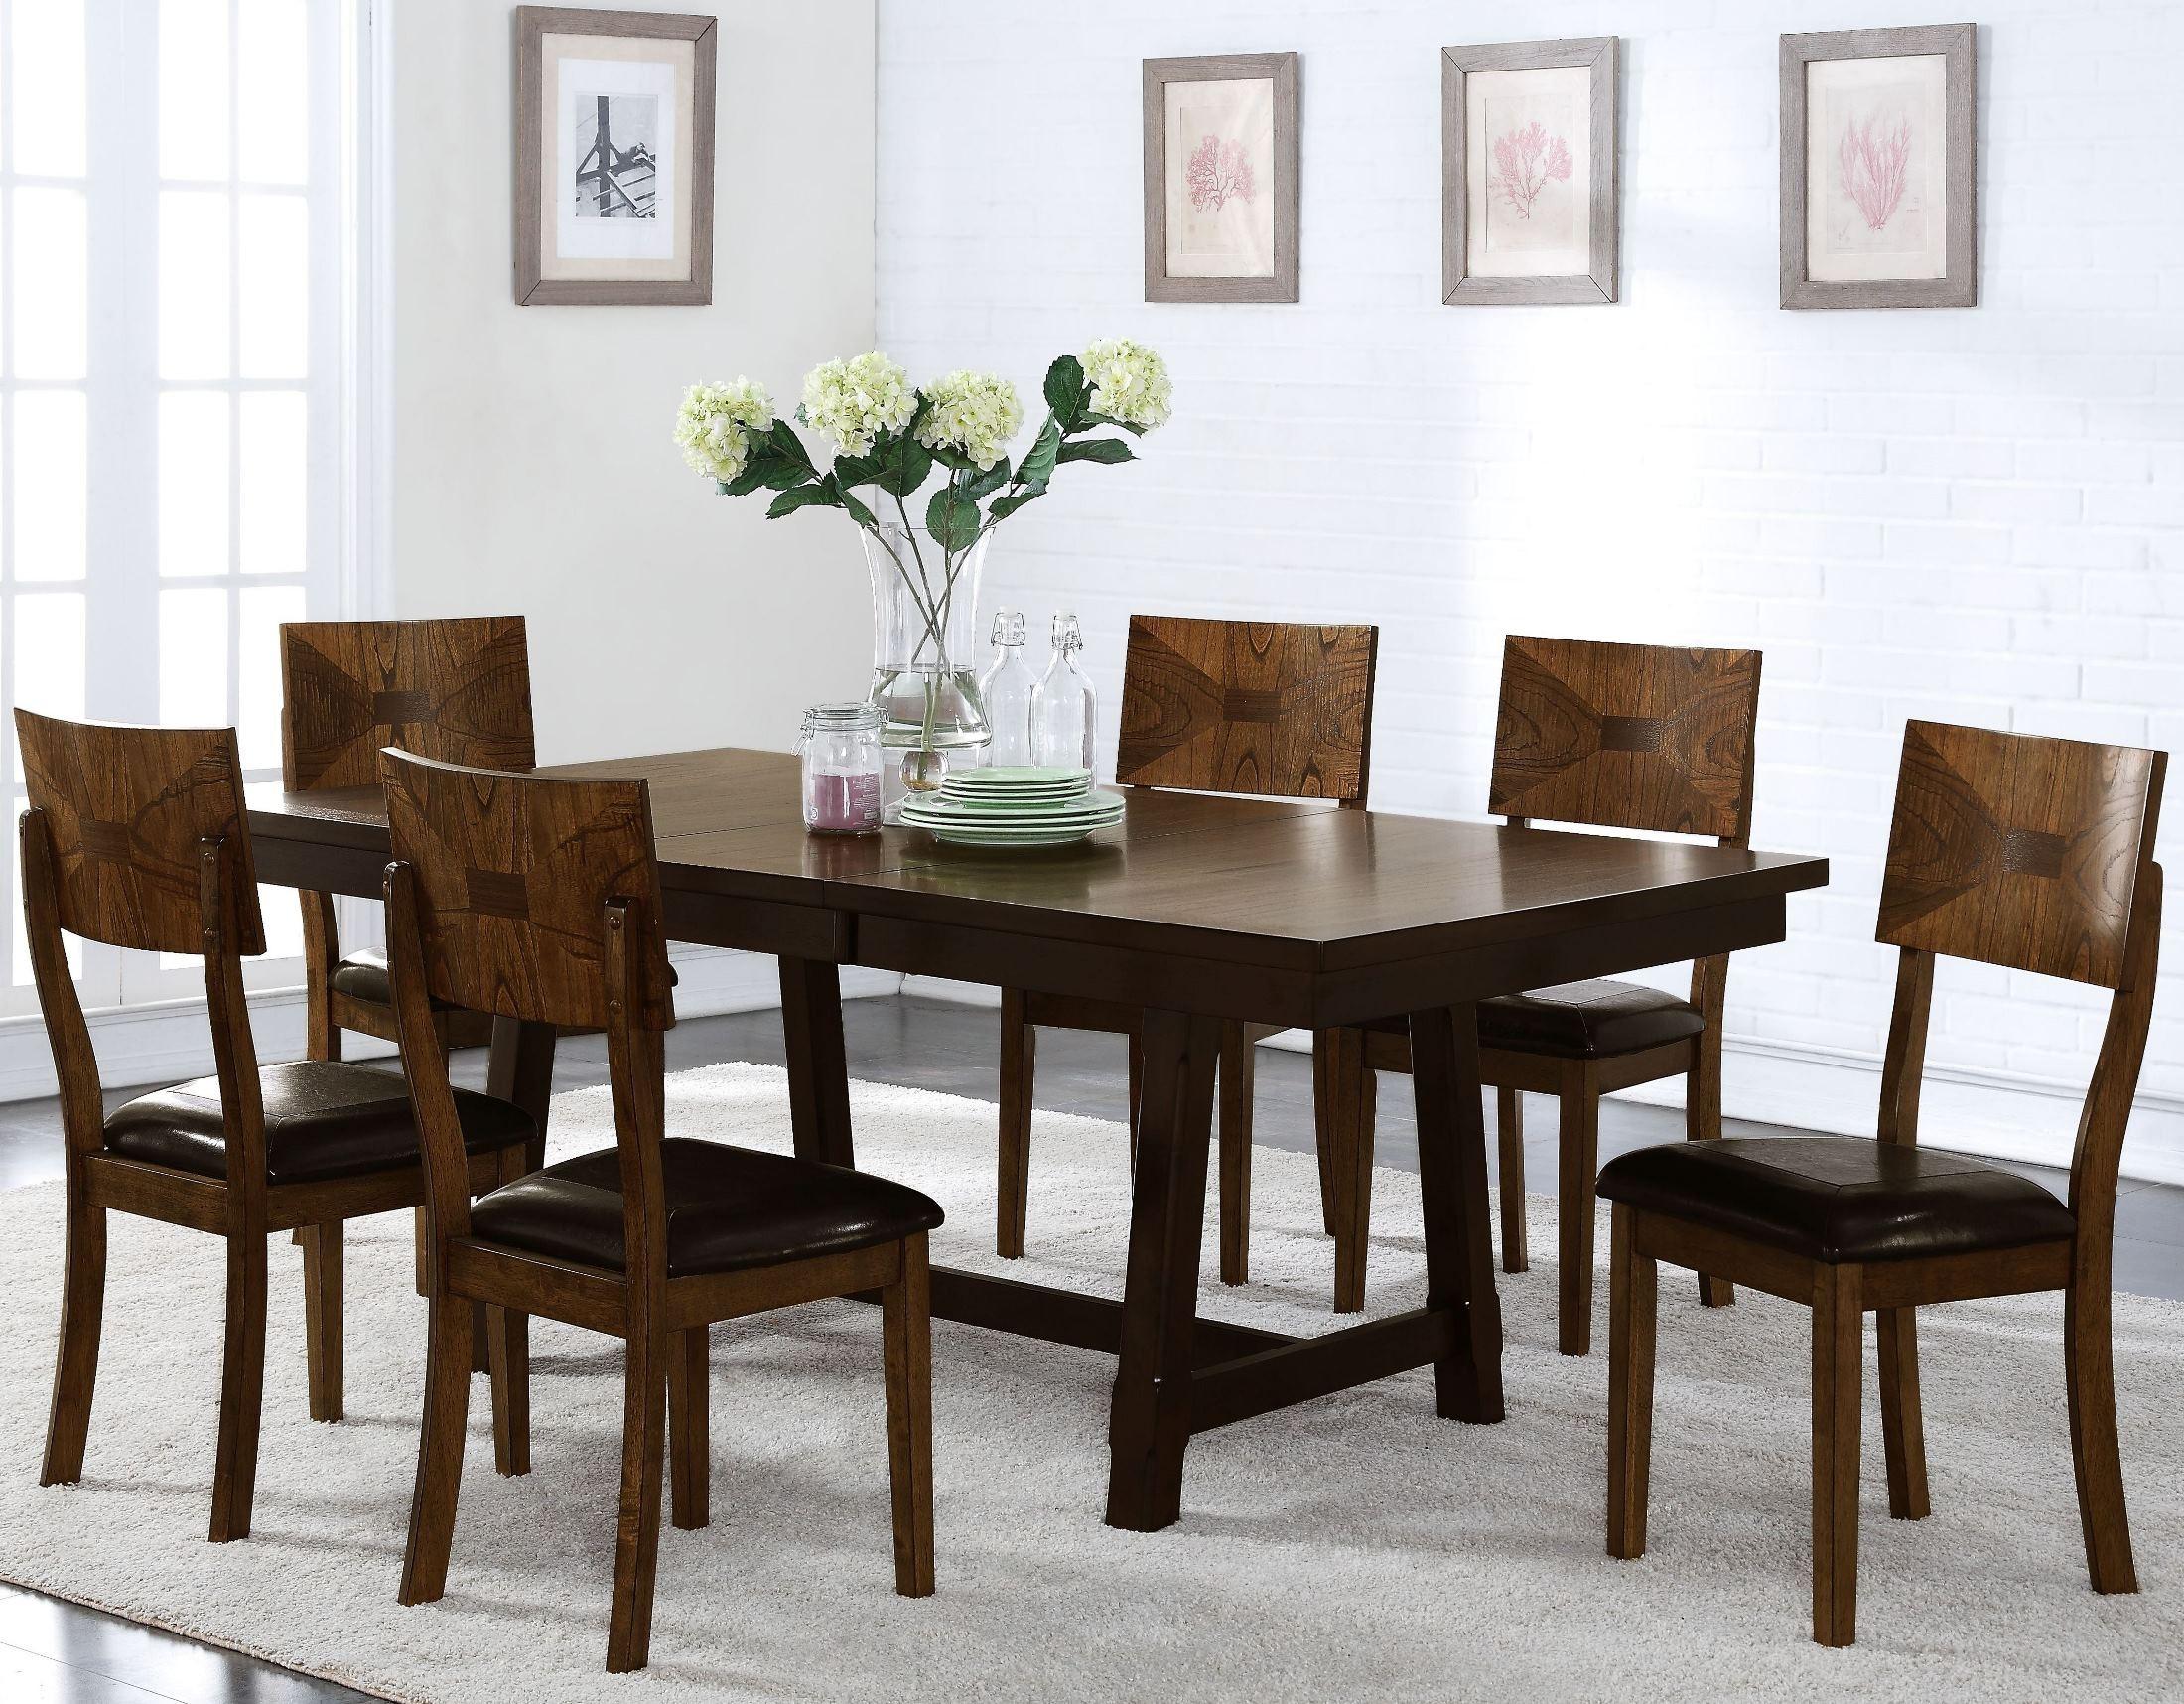 gillian two tone dining room set d228 10 new classics. Black Bedroom Furniture Sets. Home Design Ideas